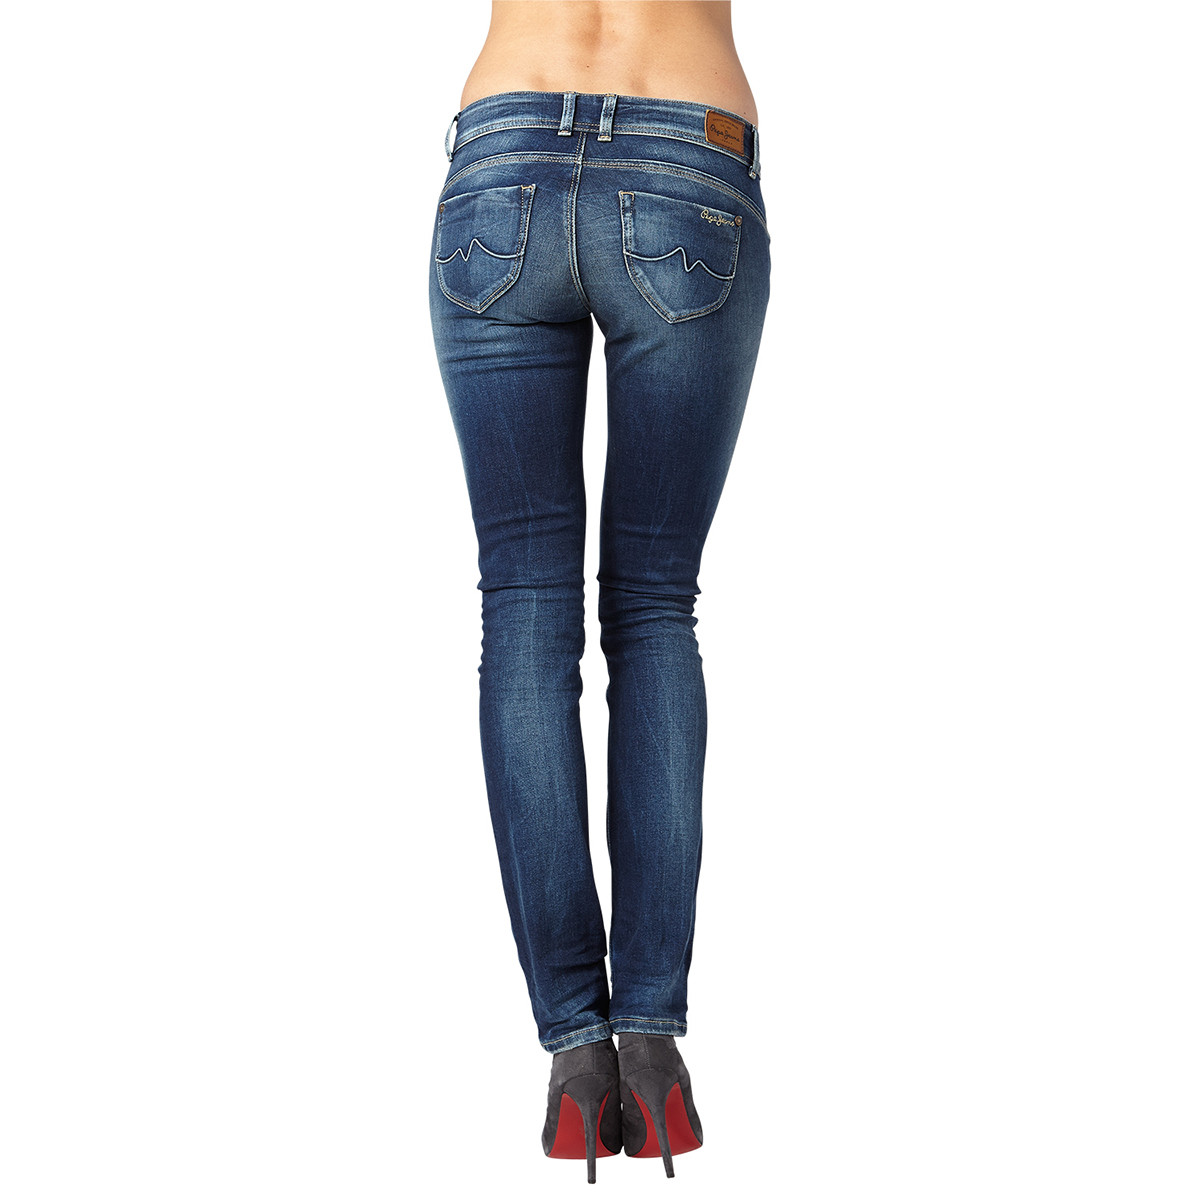 New Brooke Jeans Longueur 32 Femme